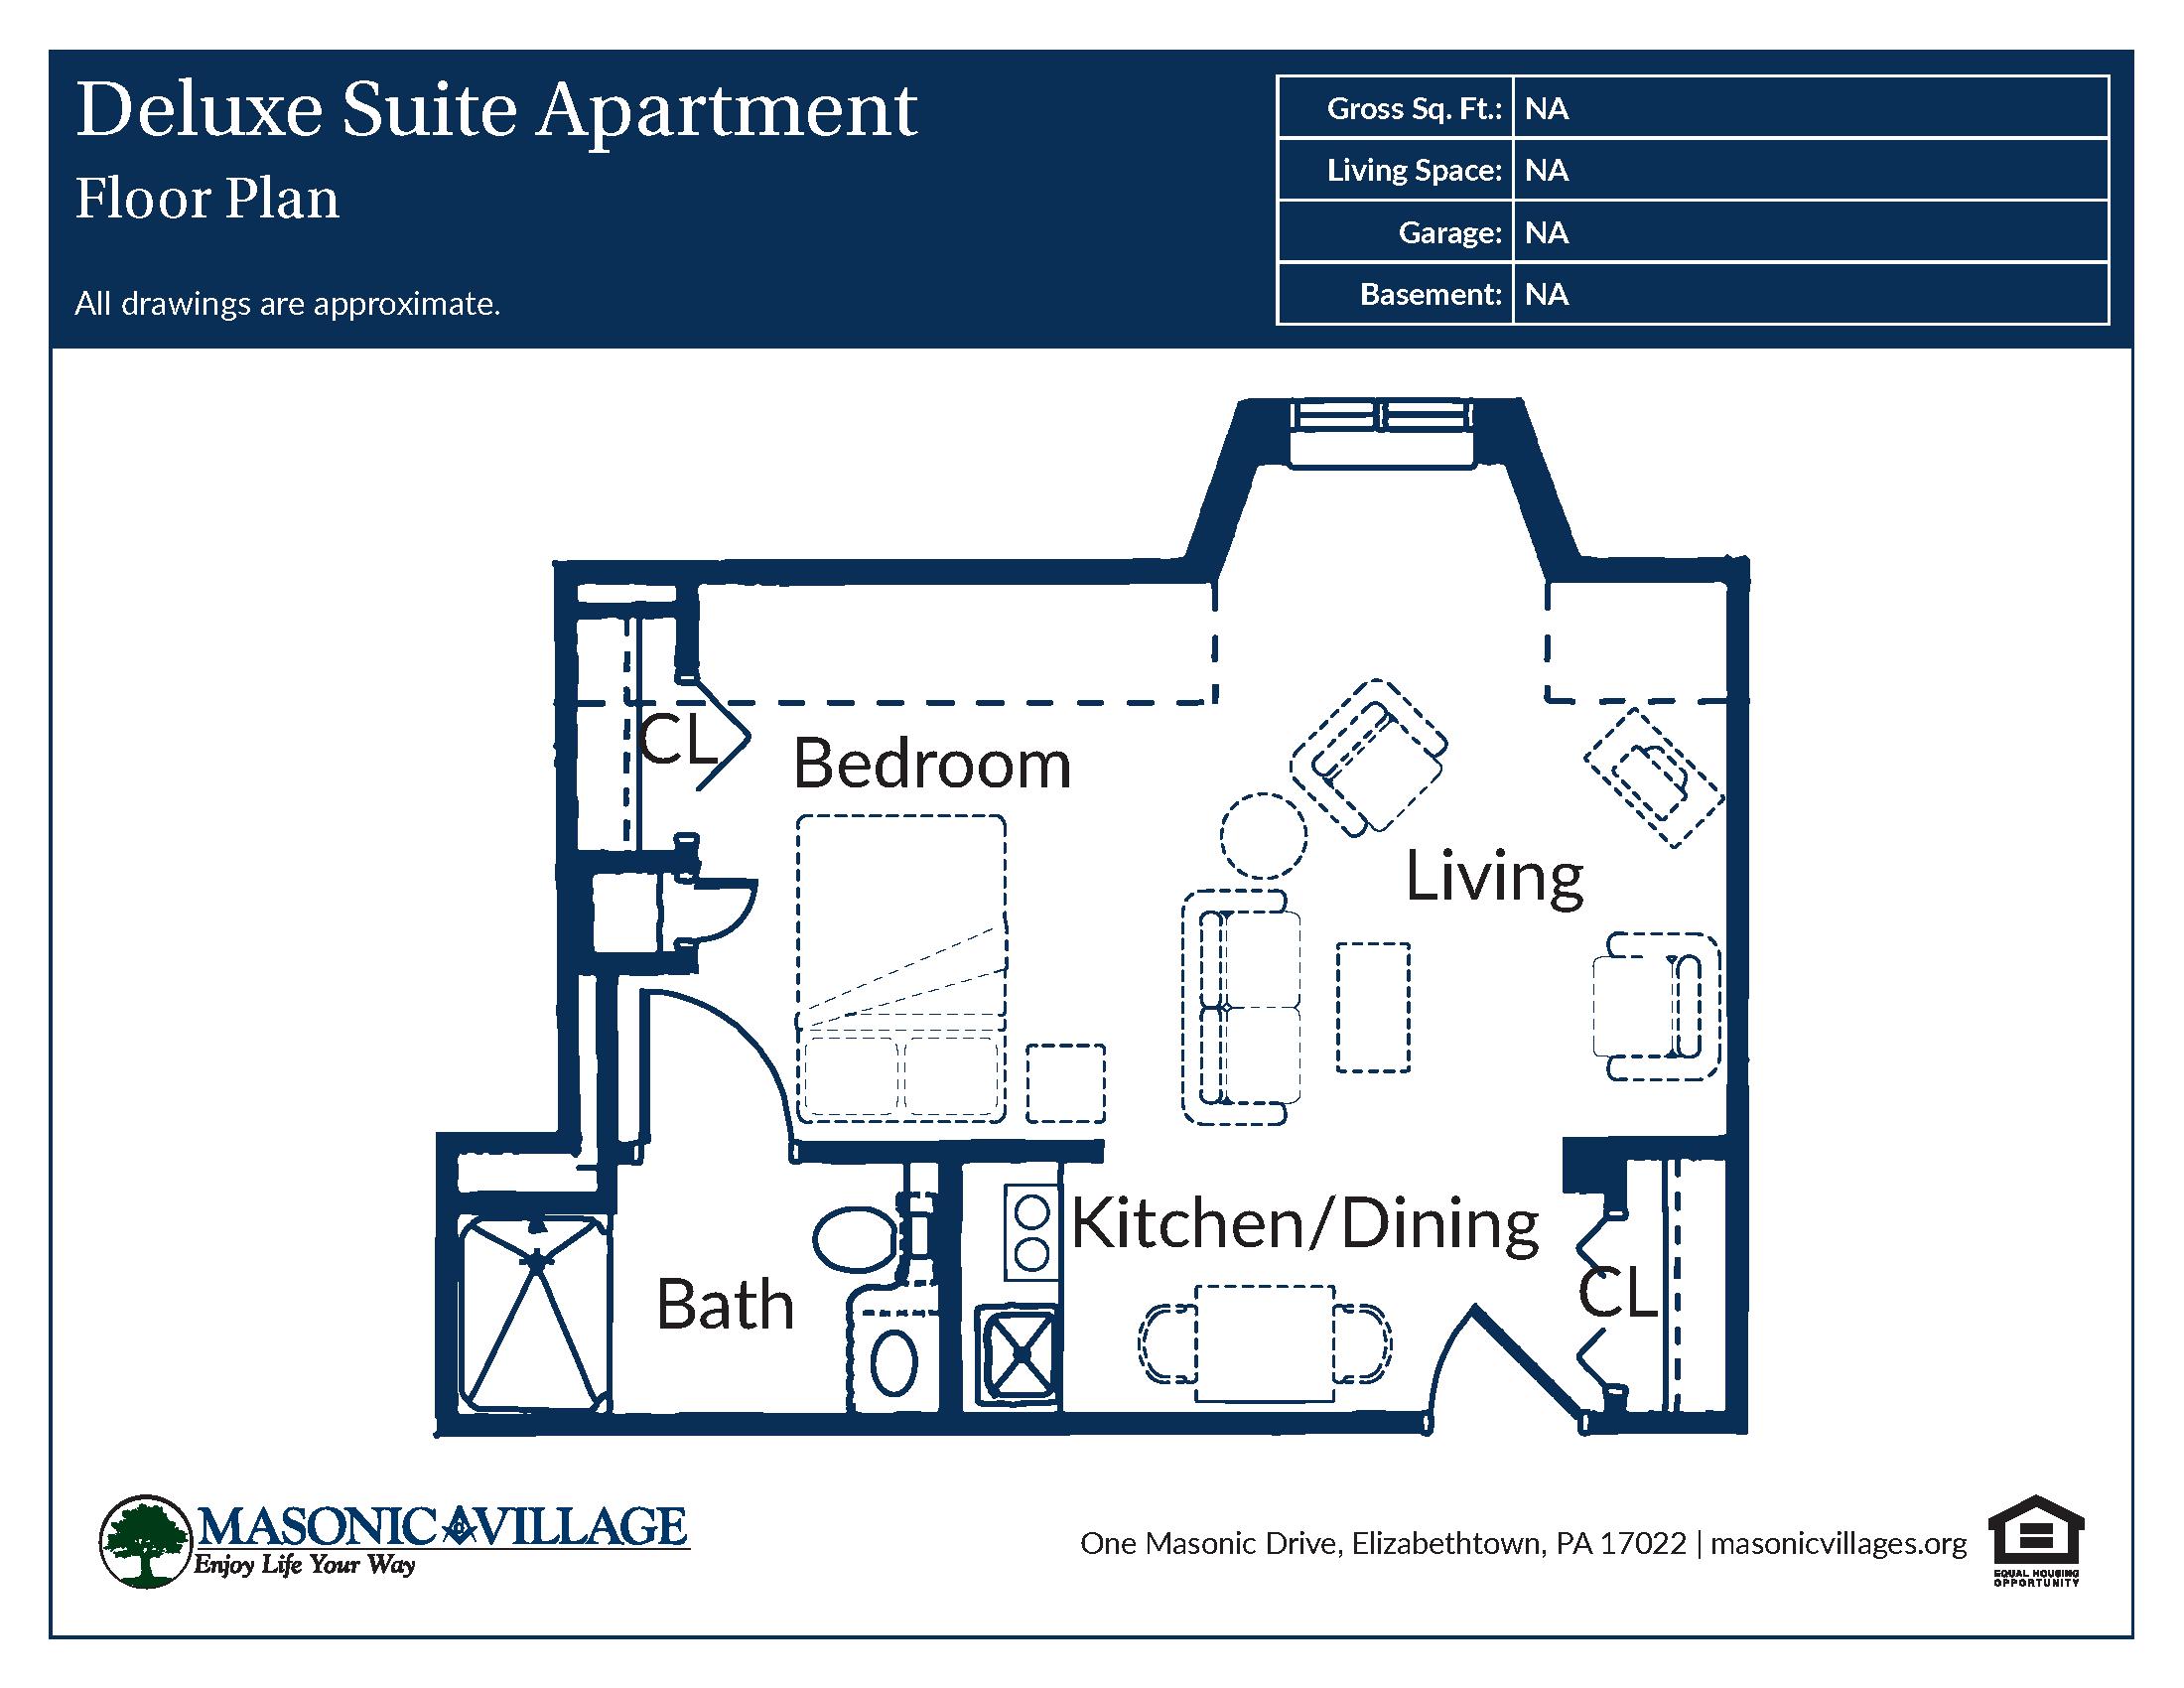 Masonic Village at Elizabethtown - Apartment Deluxe Suite Floor Plan